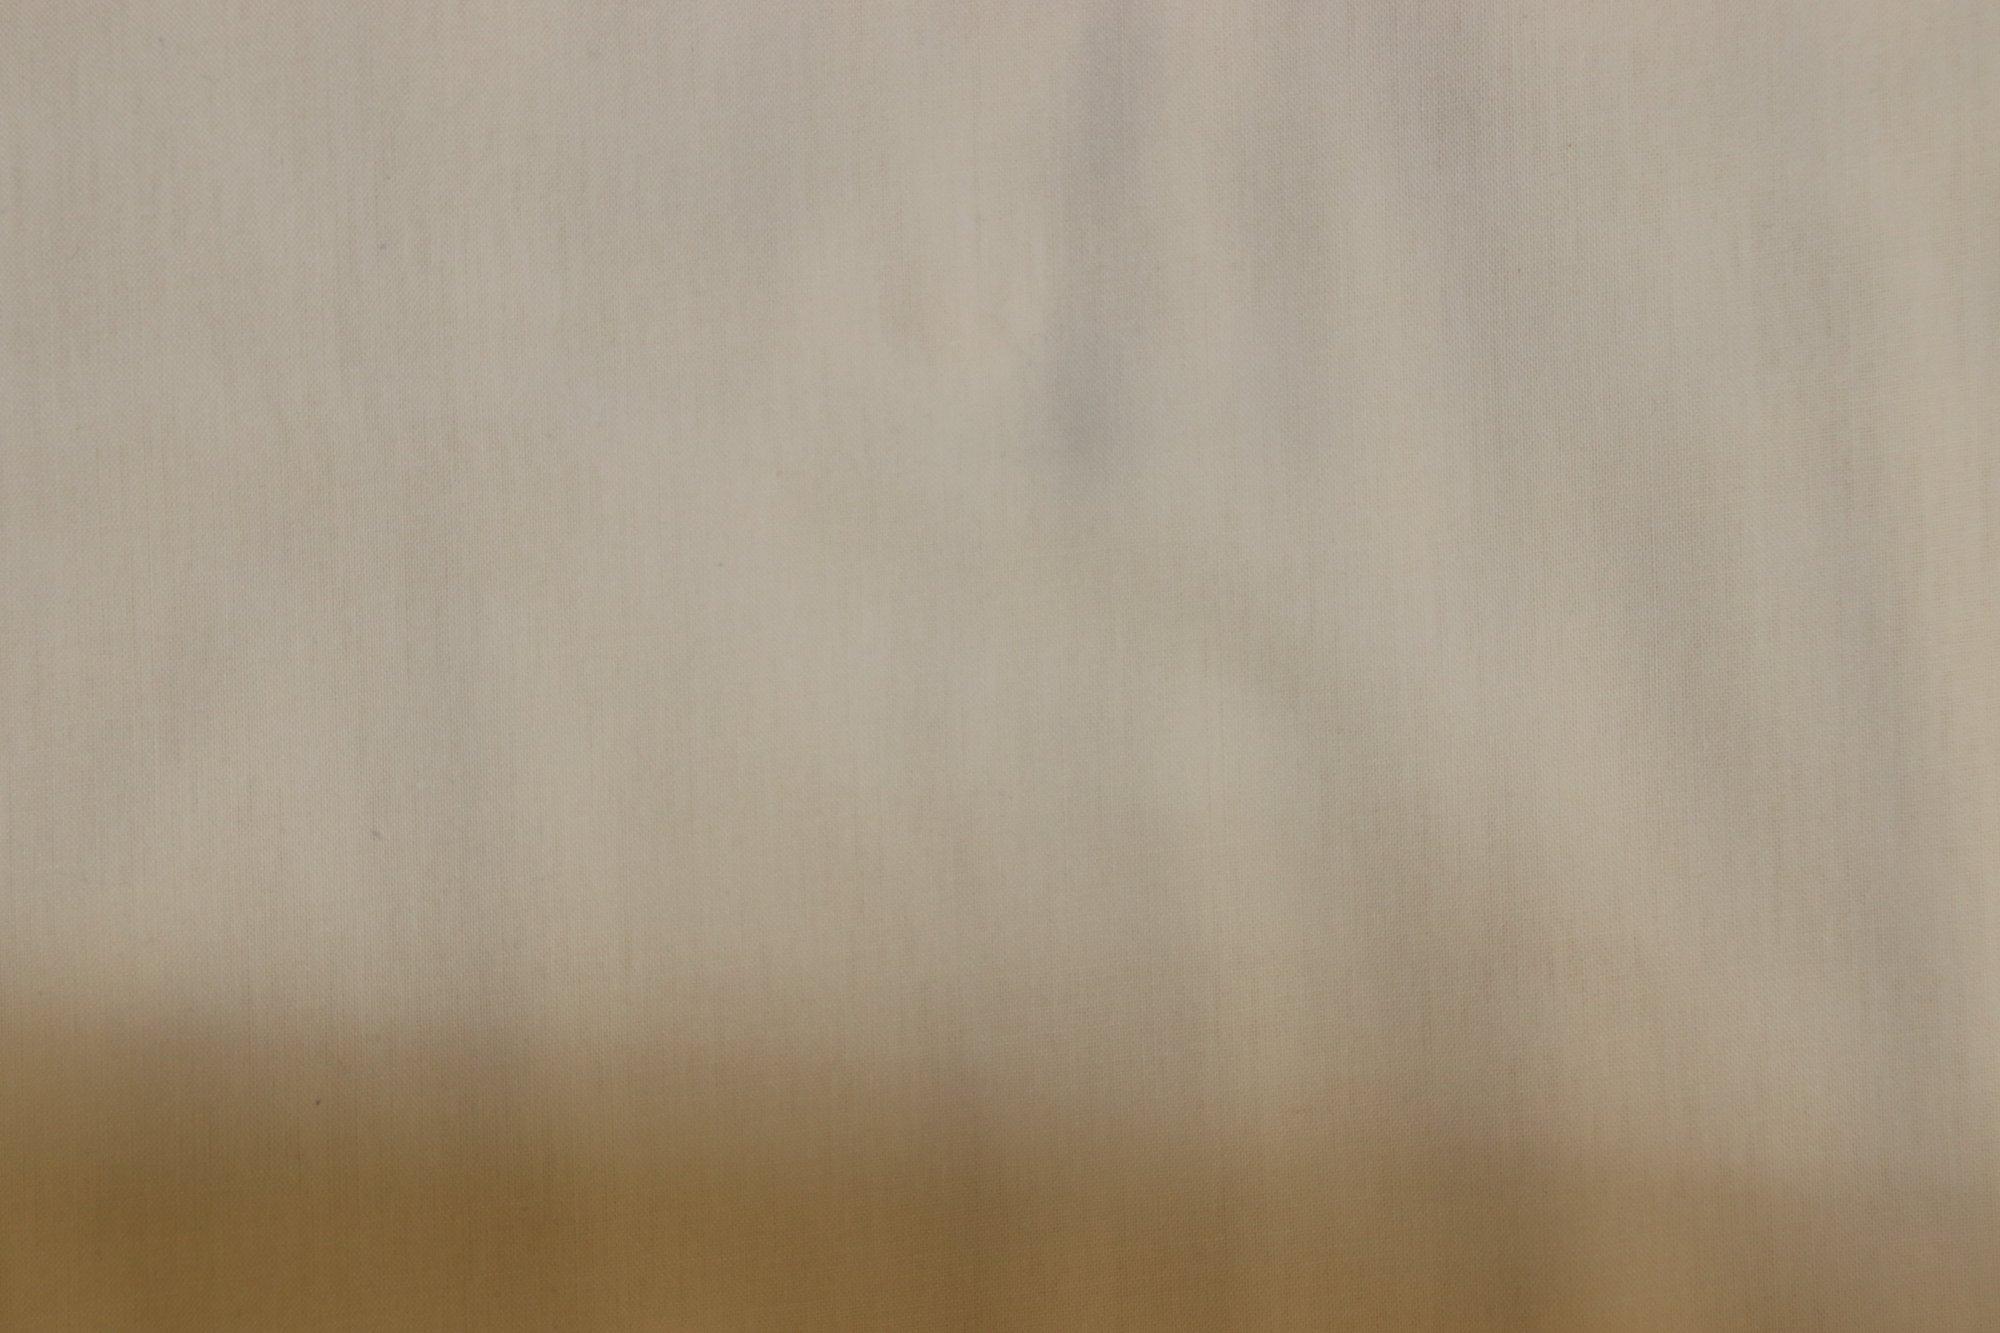 Martha Pullen Co. Victorian Batiste 100% cotton ivory